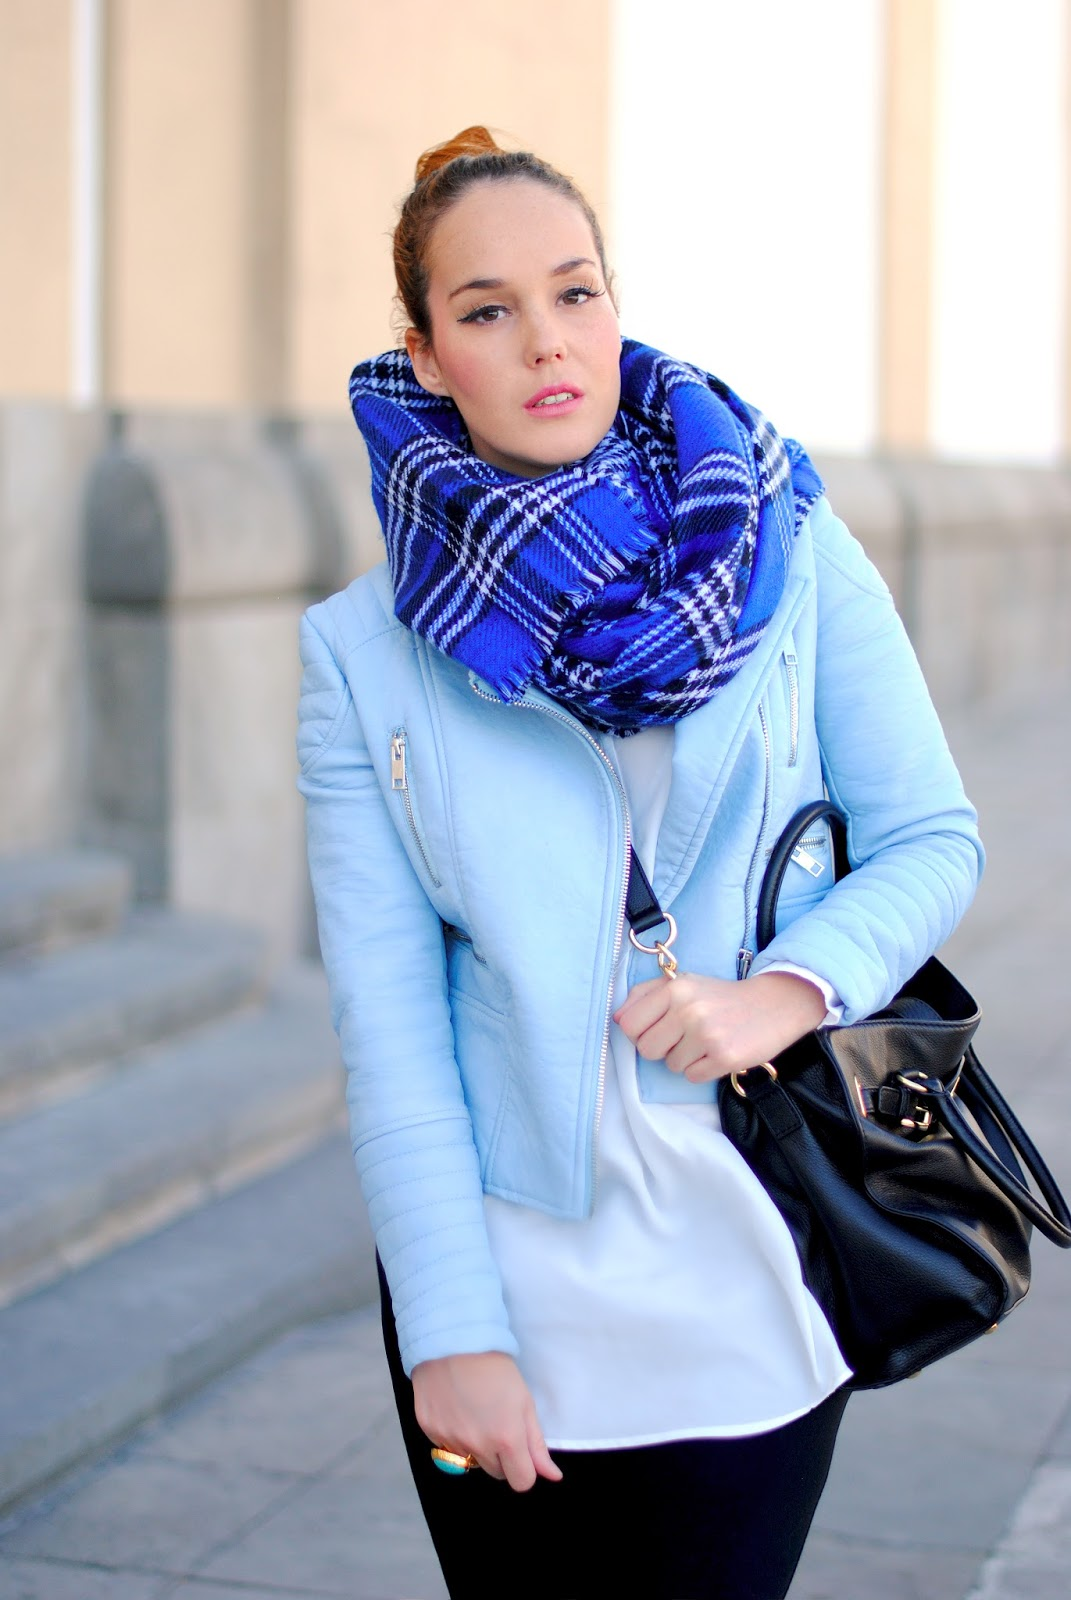 Nery hdez, tartan scarf, primark, michael kors, baby blue, biker azul